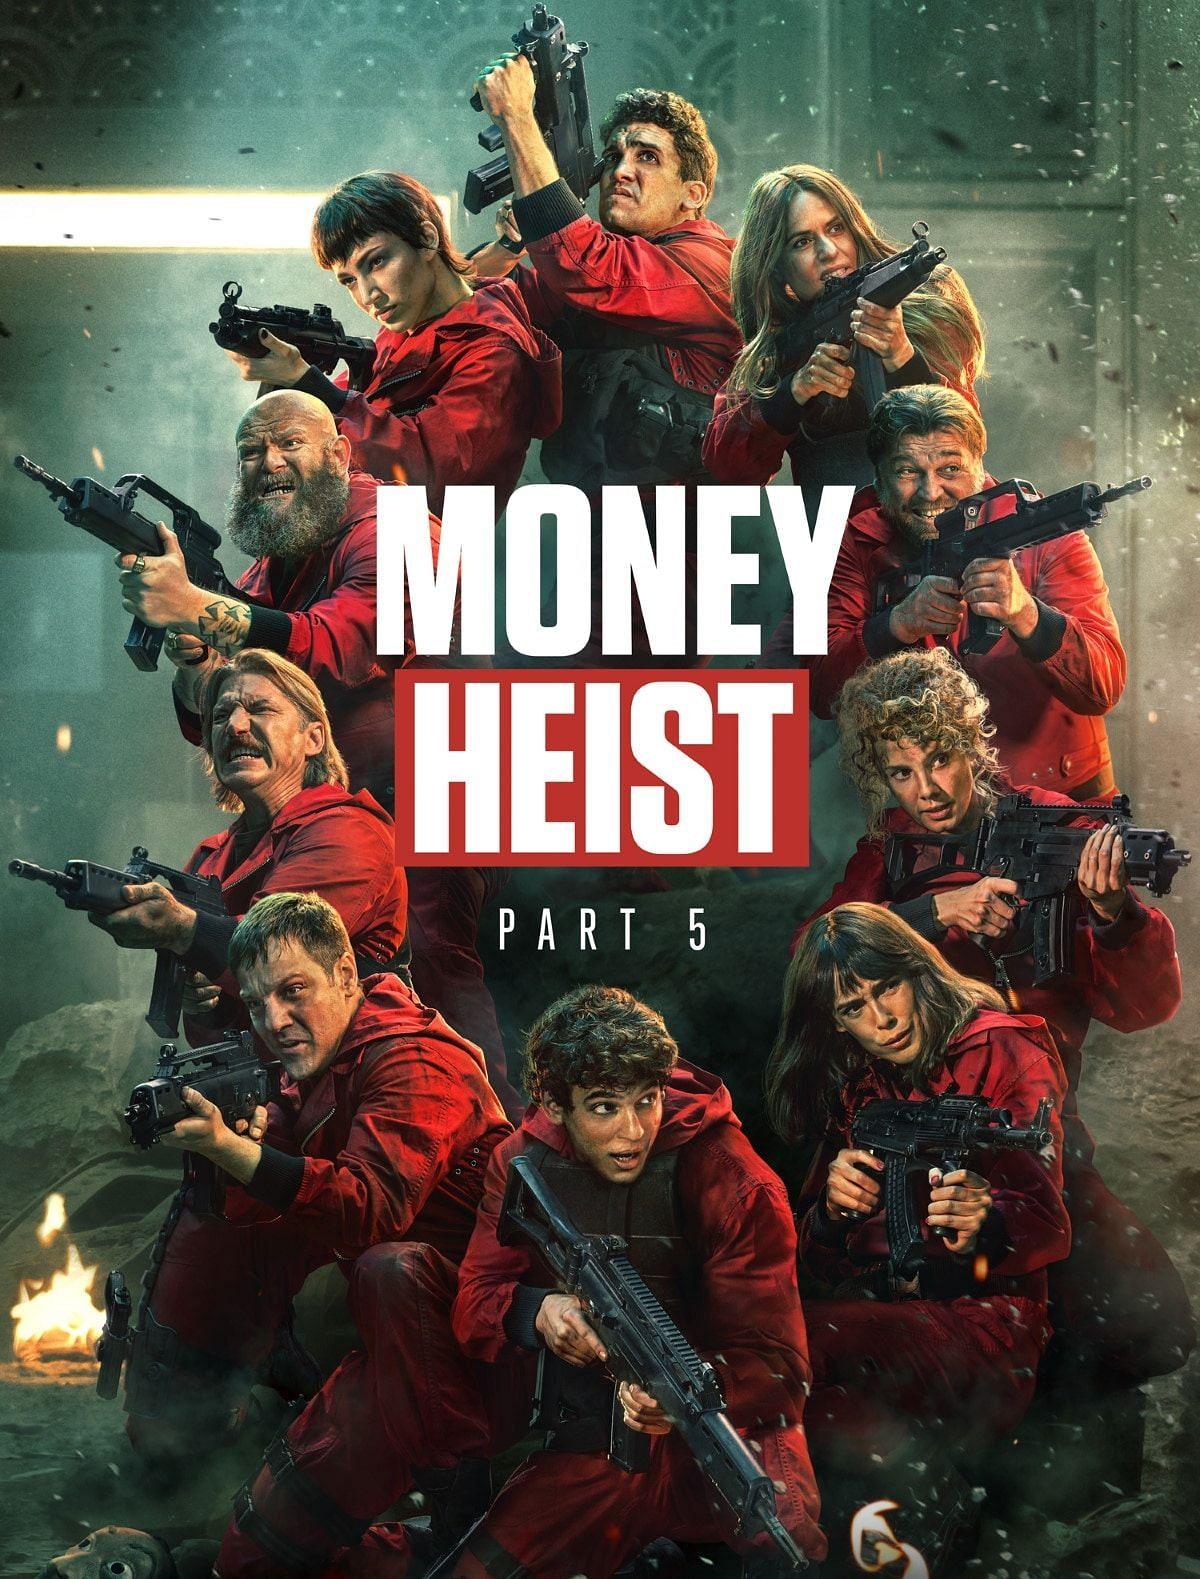 Money Heist Part 5 Vol 1